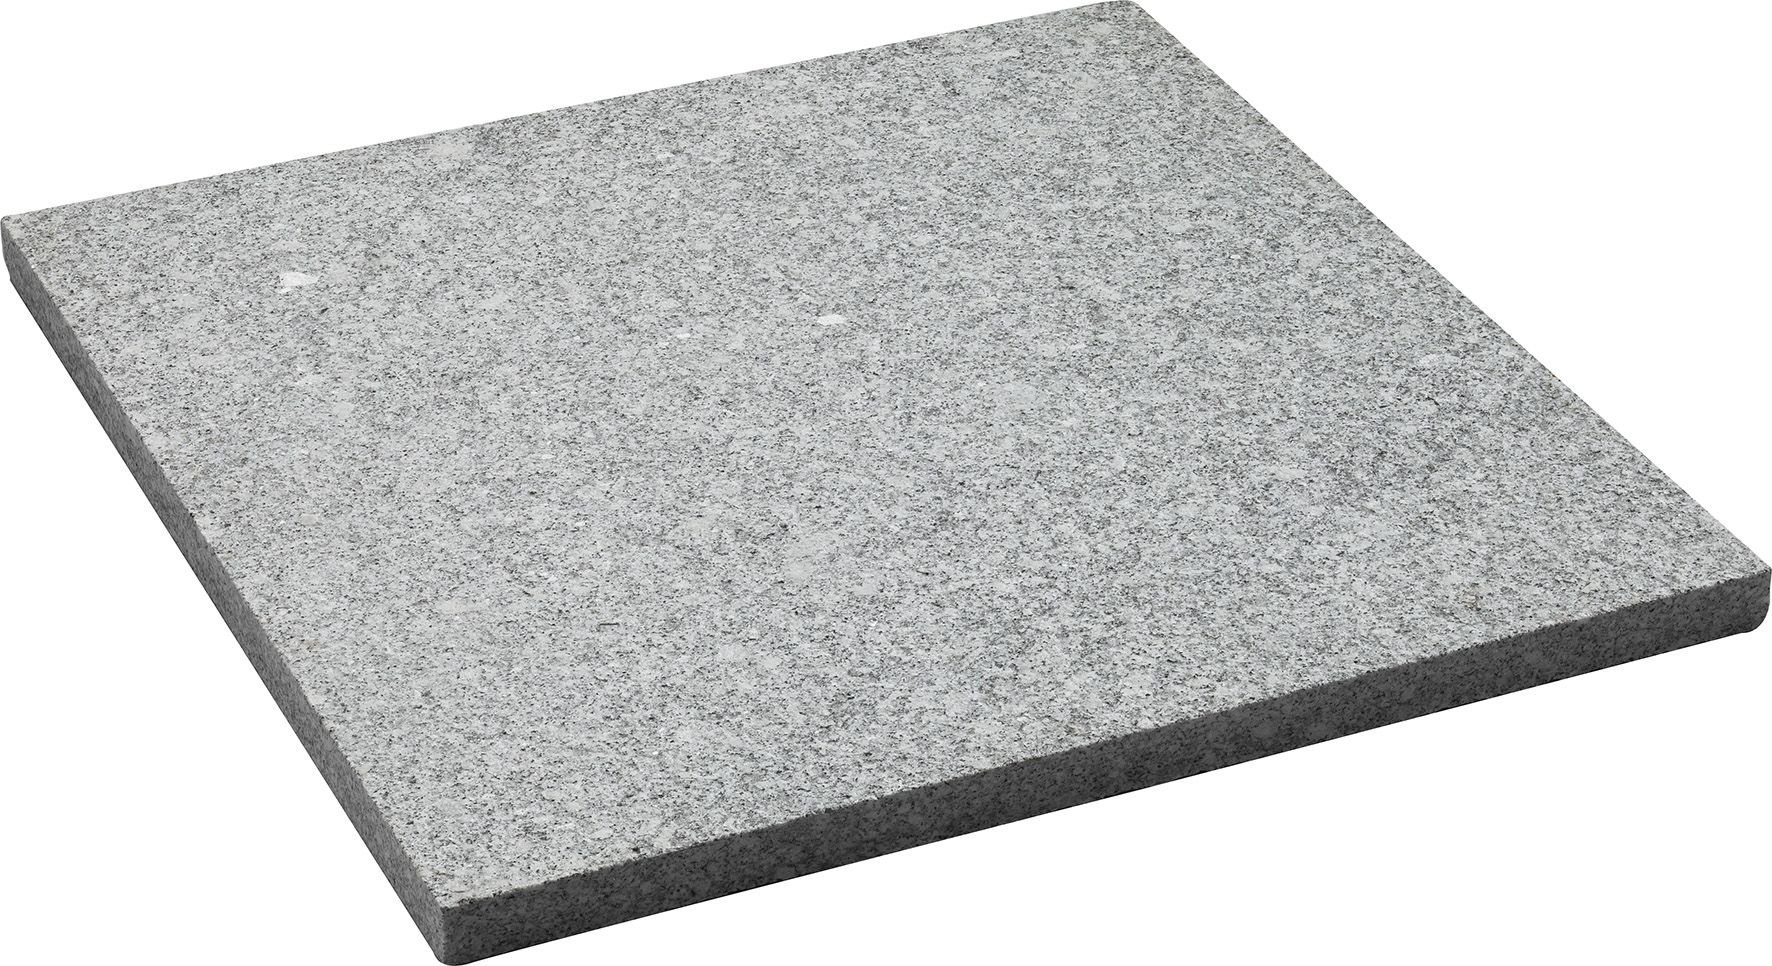 Graniitplaat 40 x 40 x 3 cm hall